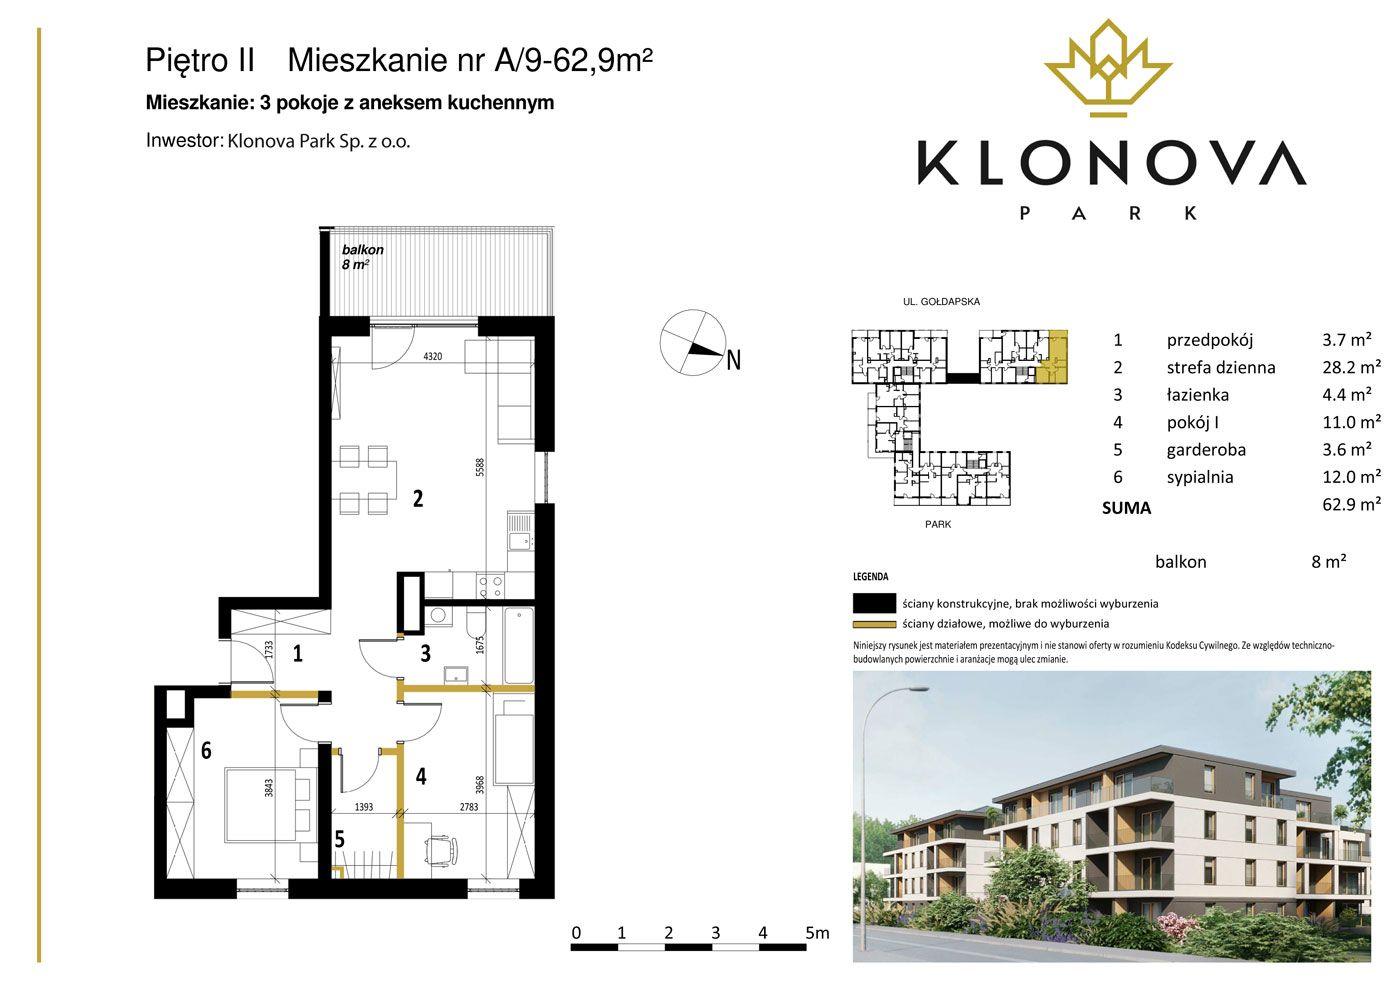 Apartamenty Klonova Park - Plan mieszkania A/9